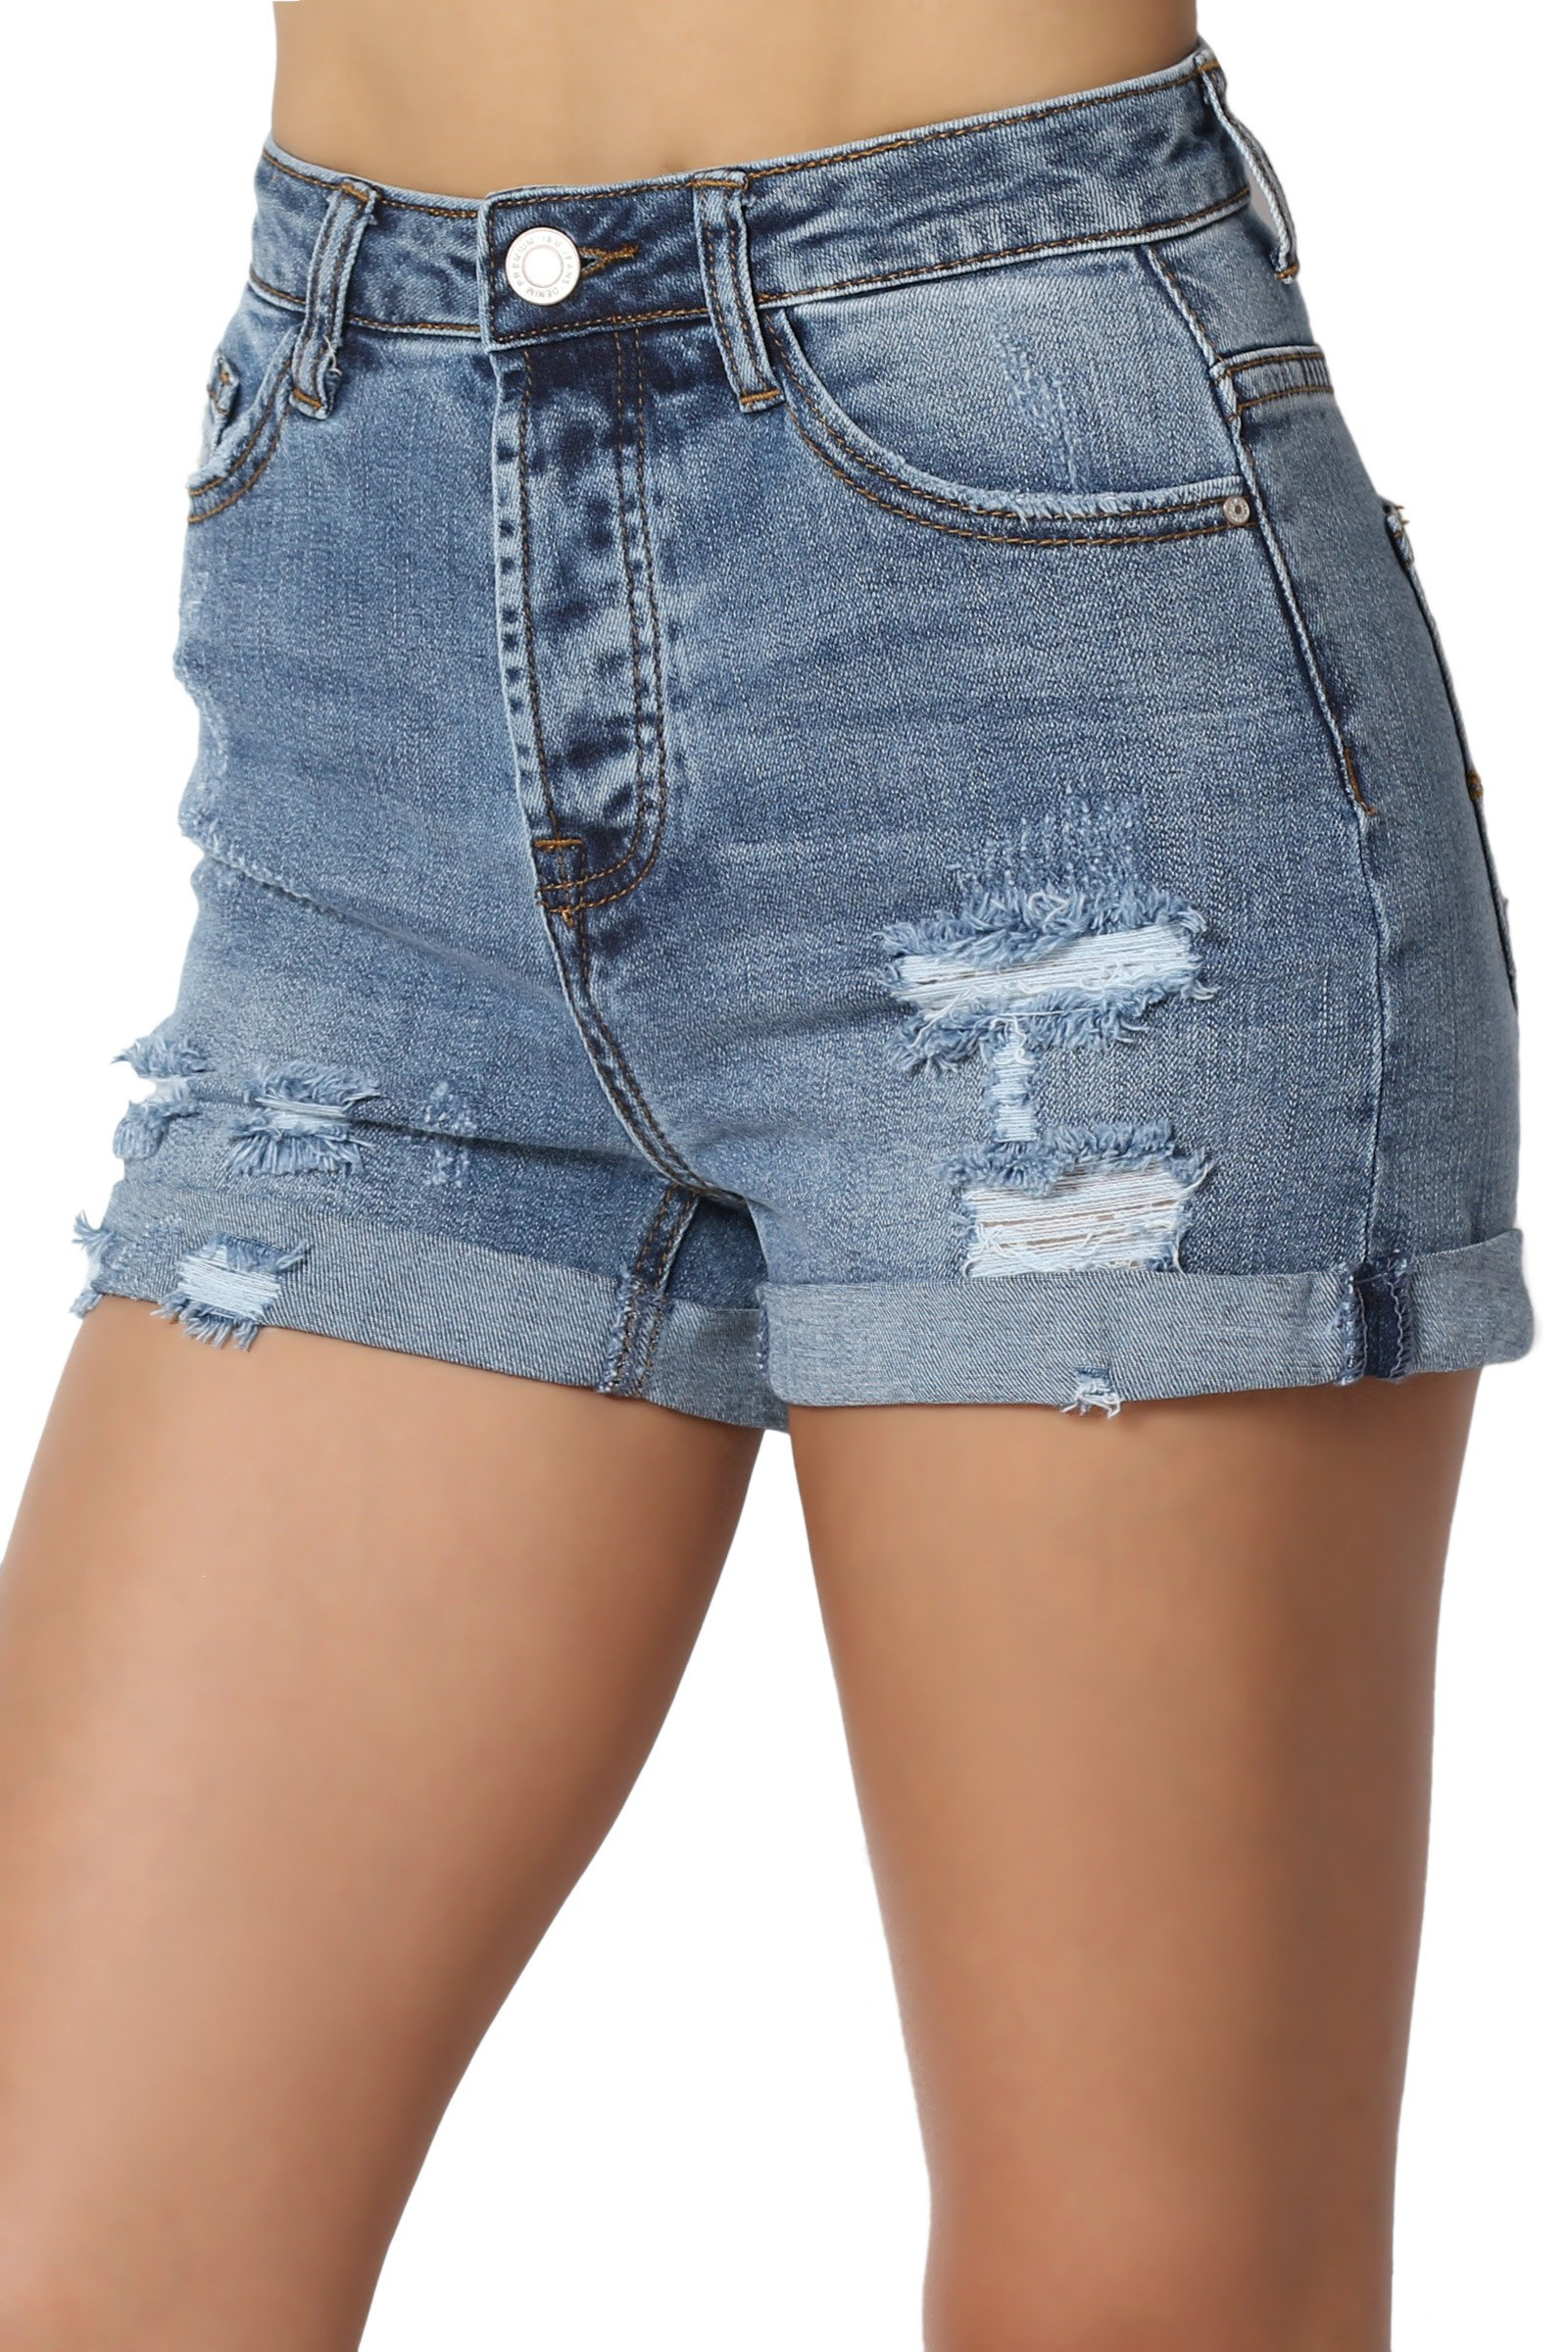 TheMogan Junior's Vintage Distressed High Waist Roll up Denim Shorts Medium S